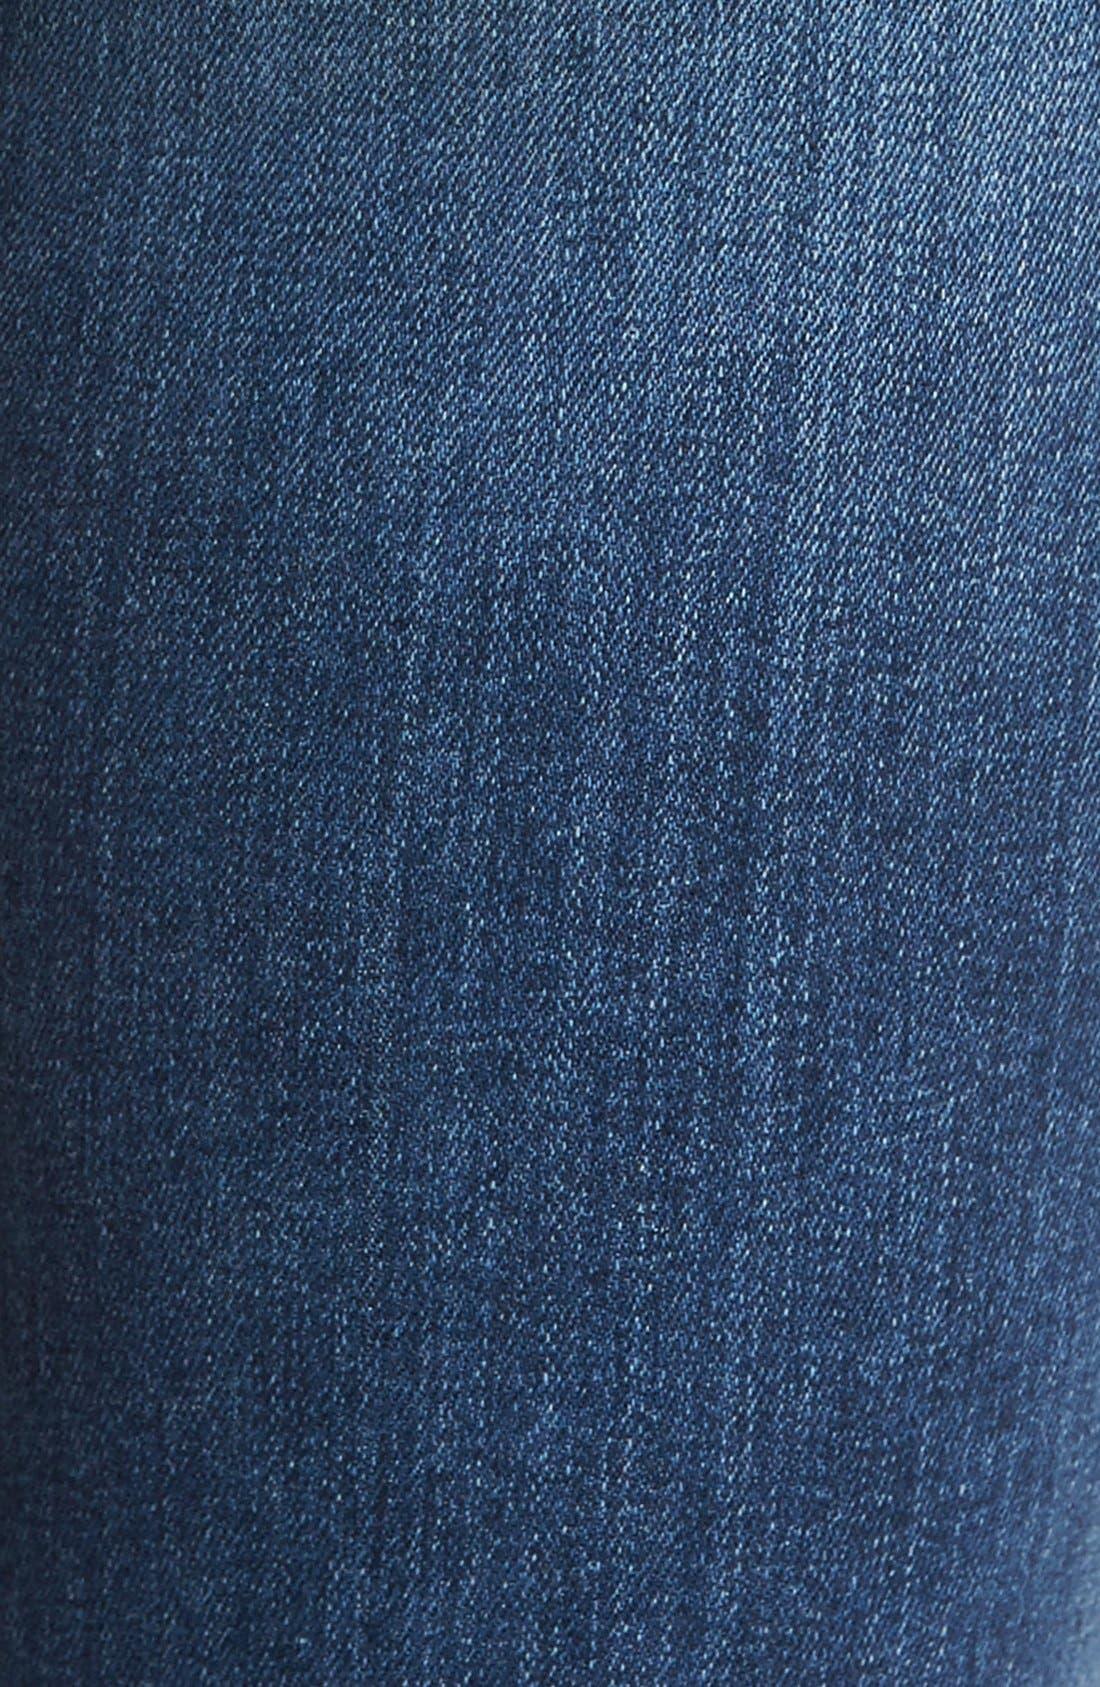 Cigarette Skinny Jeans,                             Alternate thumbnail 4, color,                             410